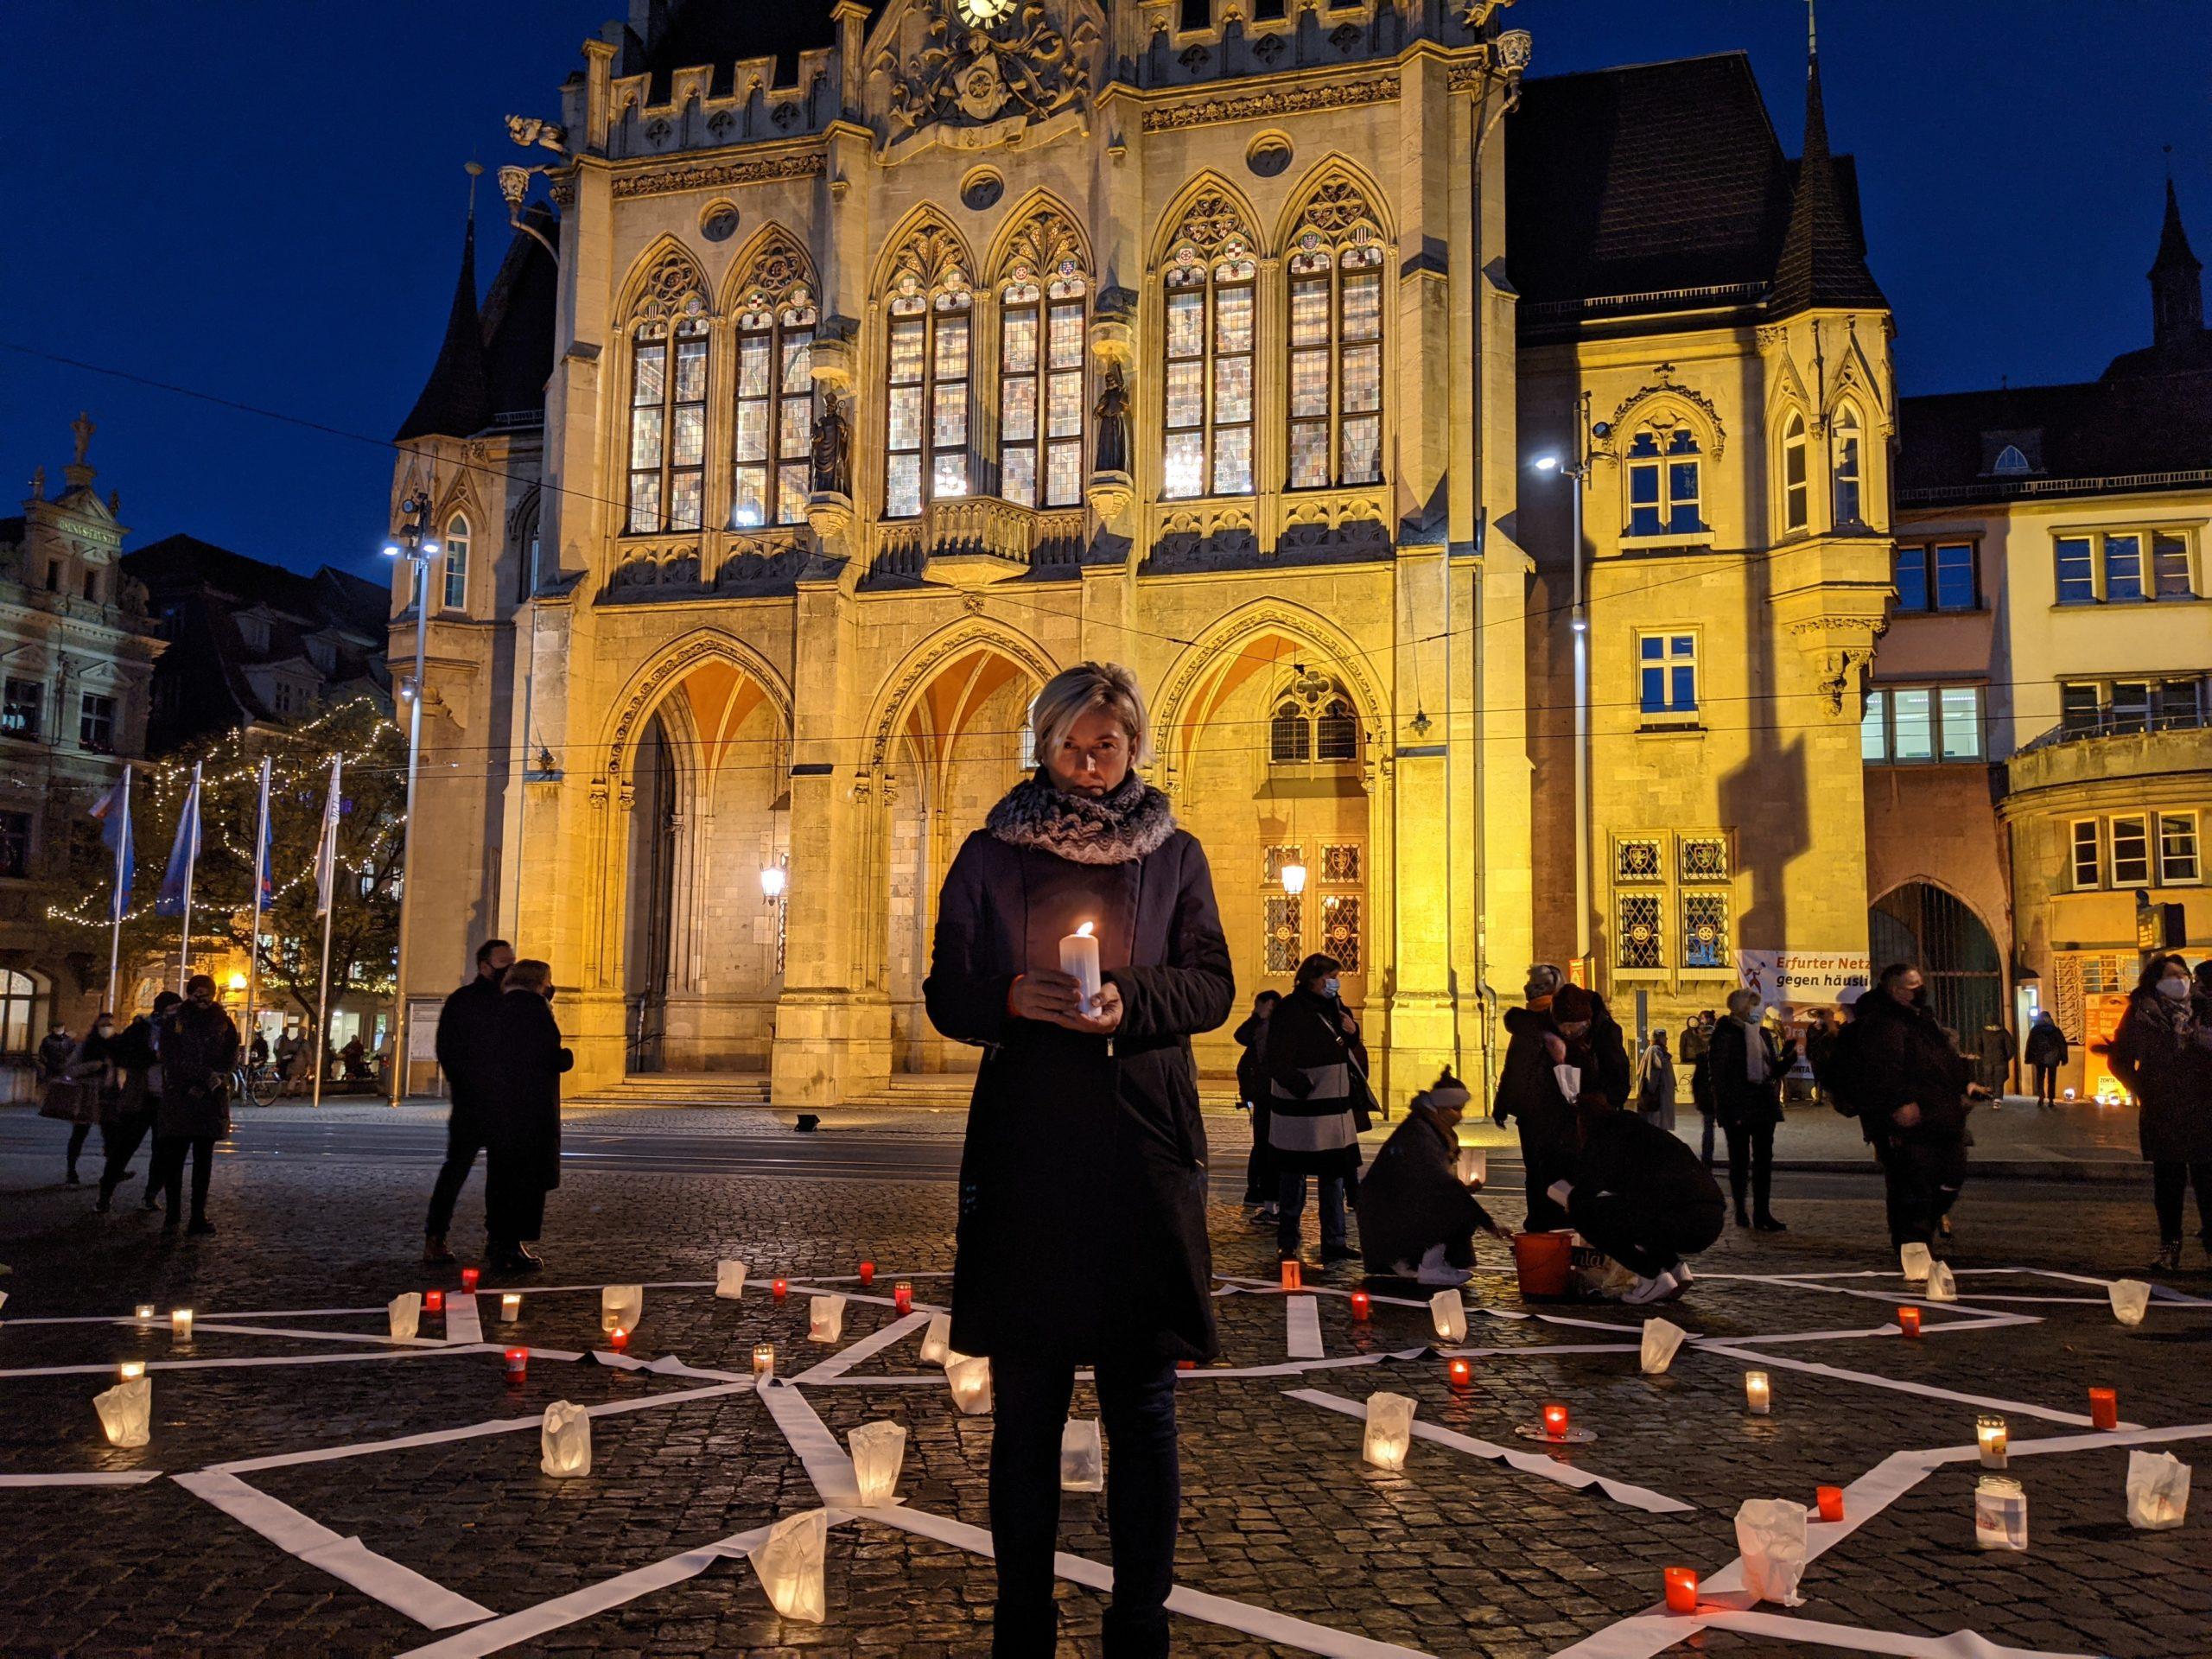 Kerzenaktion zum Internationalen Tag gegen Gewalt an Frauen